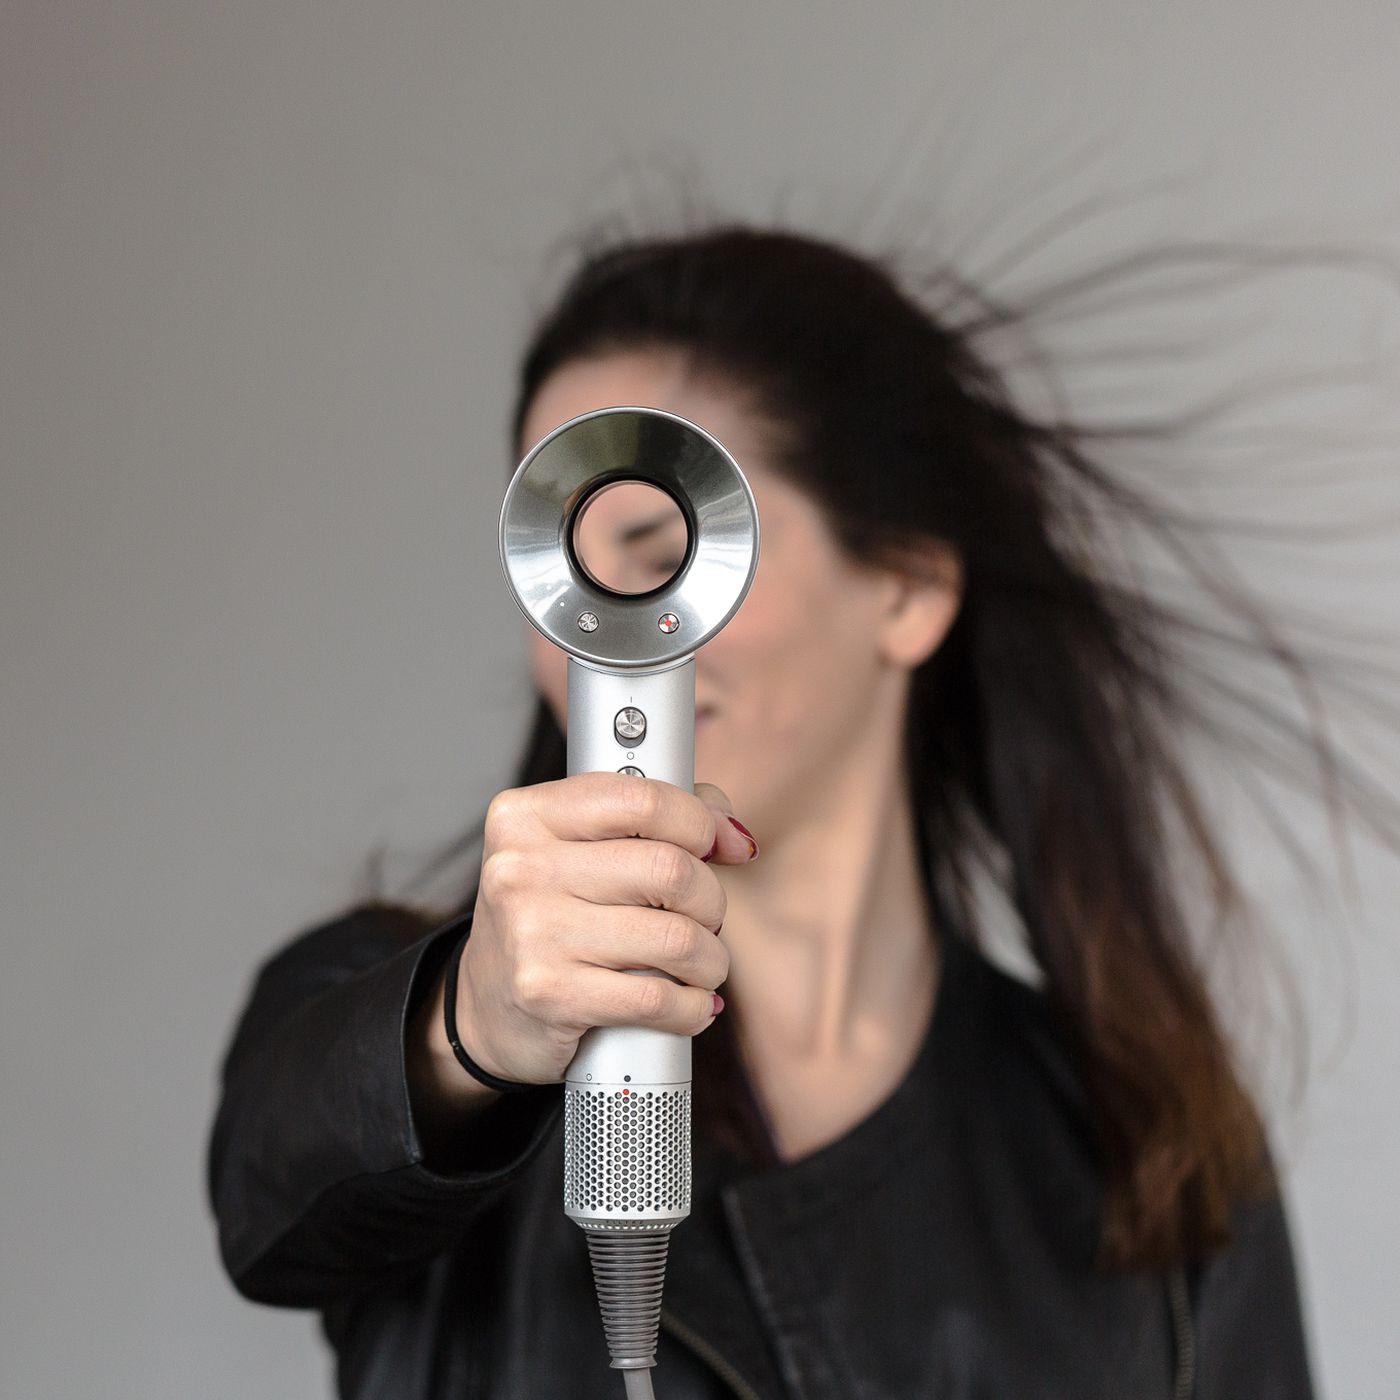 Dyson quiet hair dryer dyson v7 instructions